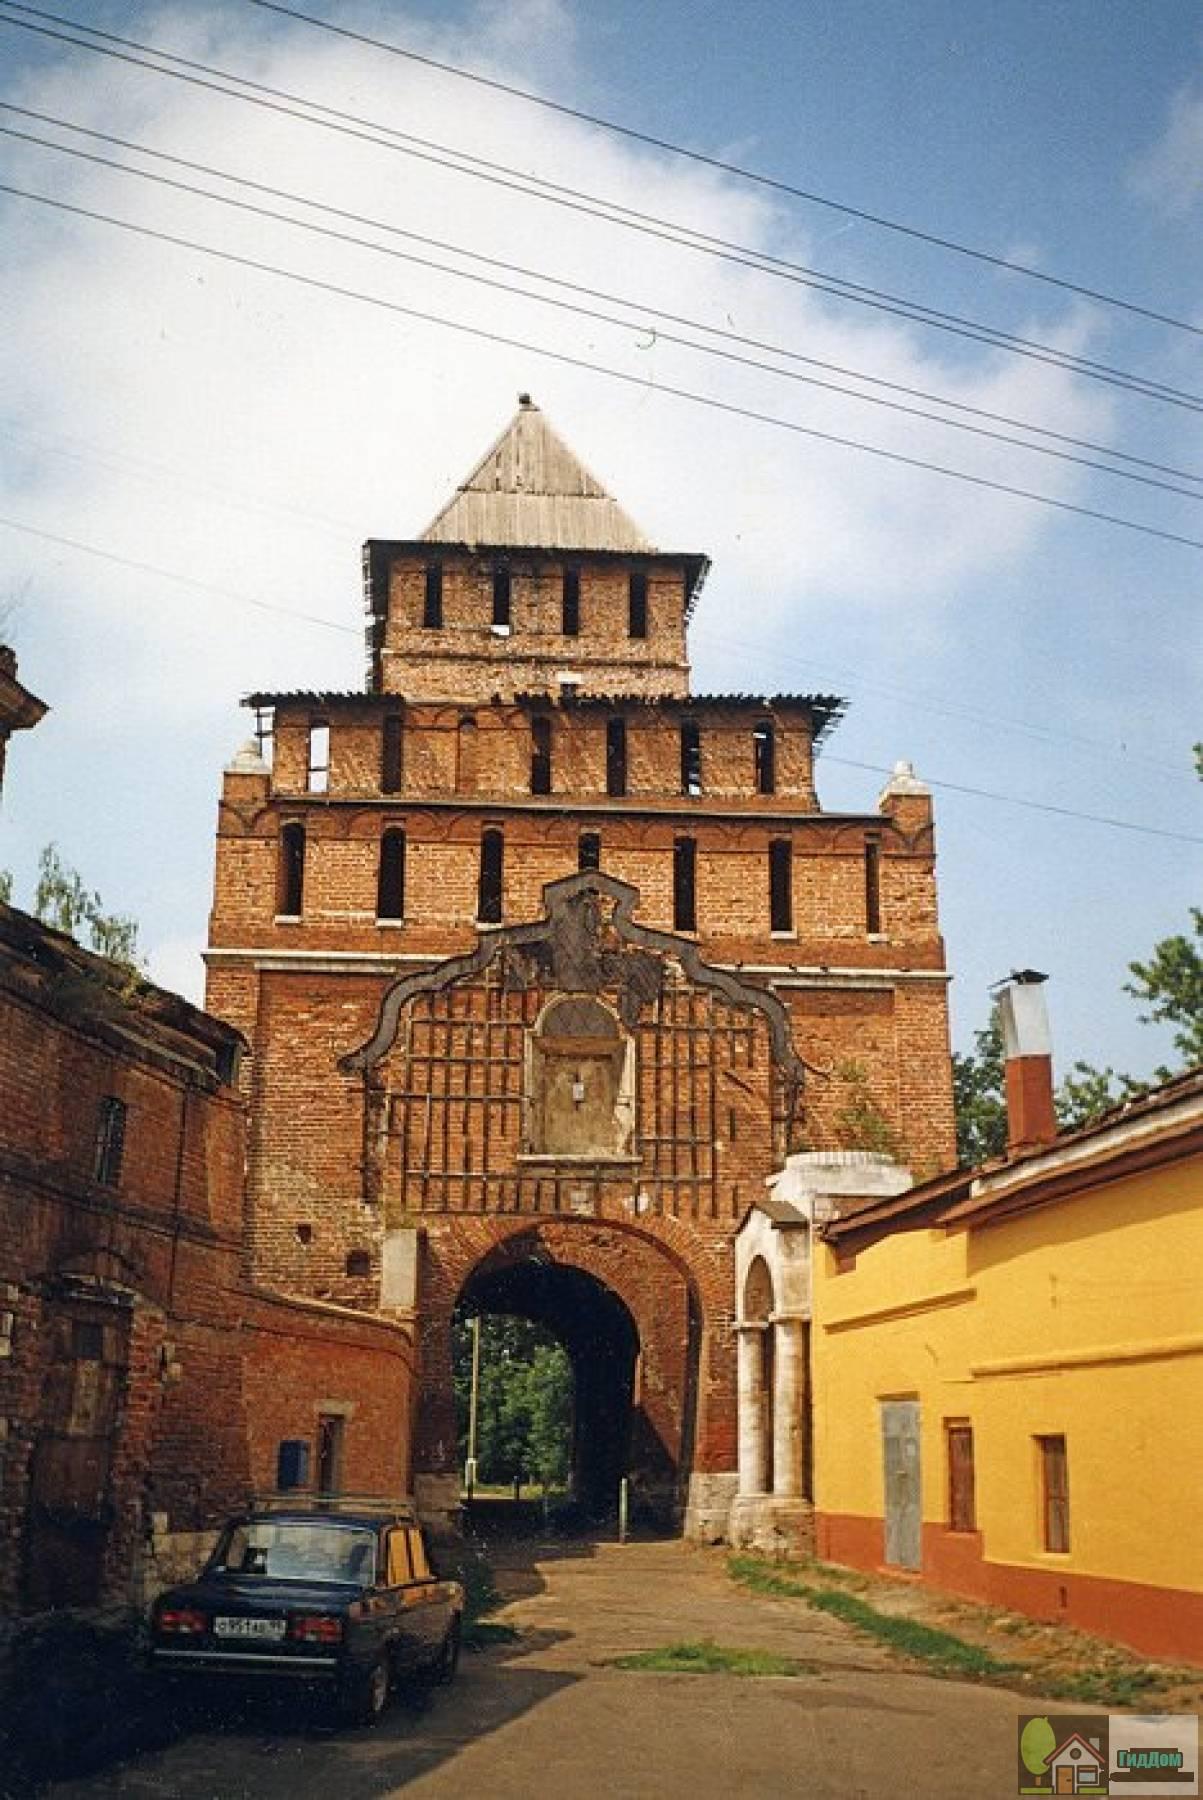 Пятницкие ворота на фотографии 2001 года